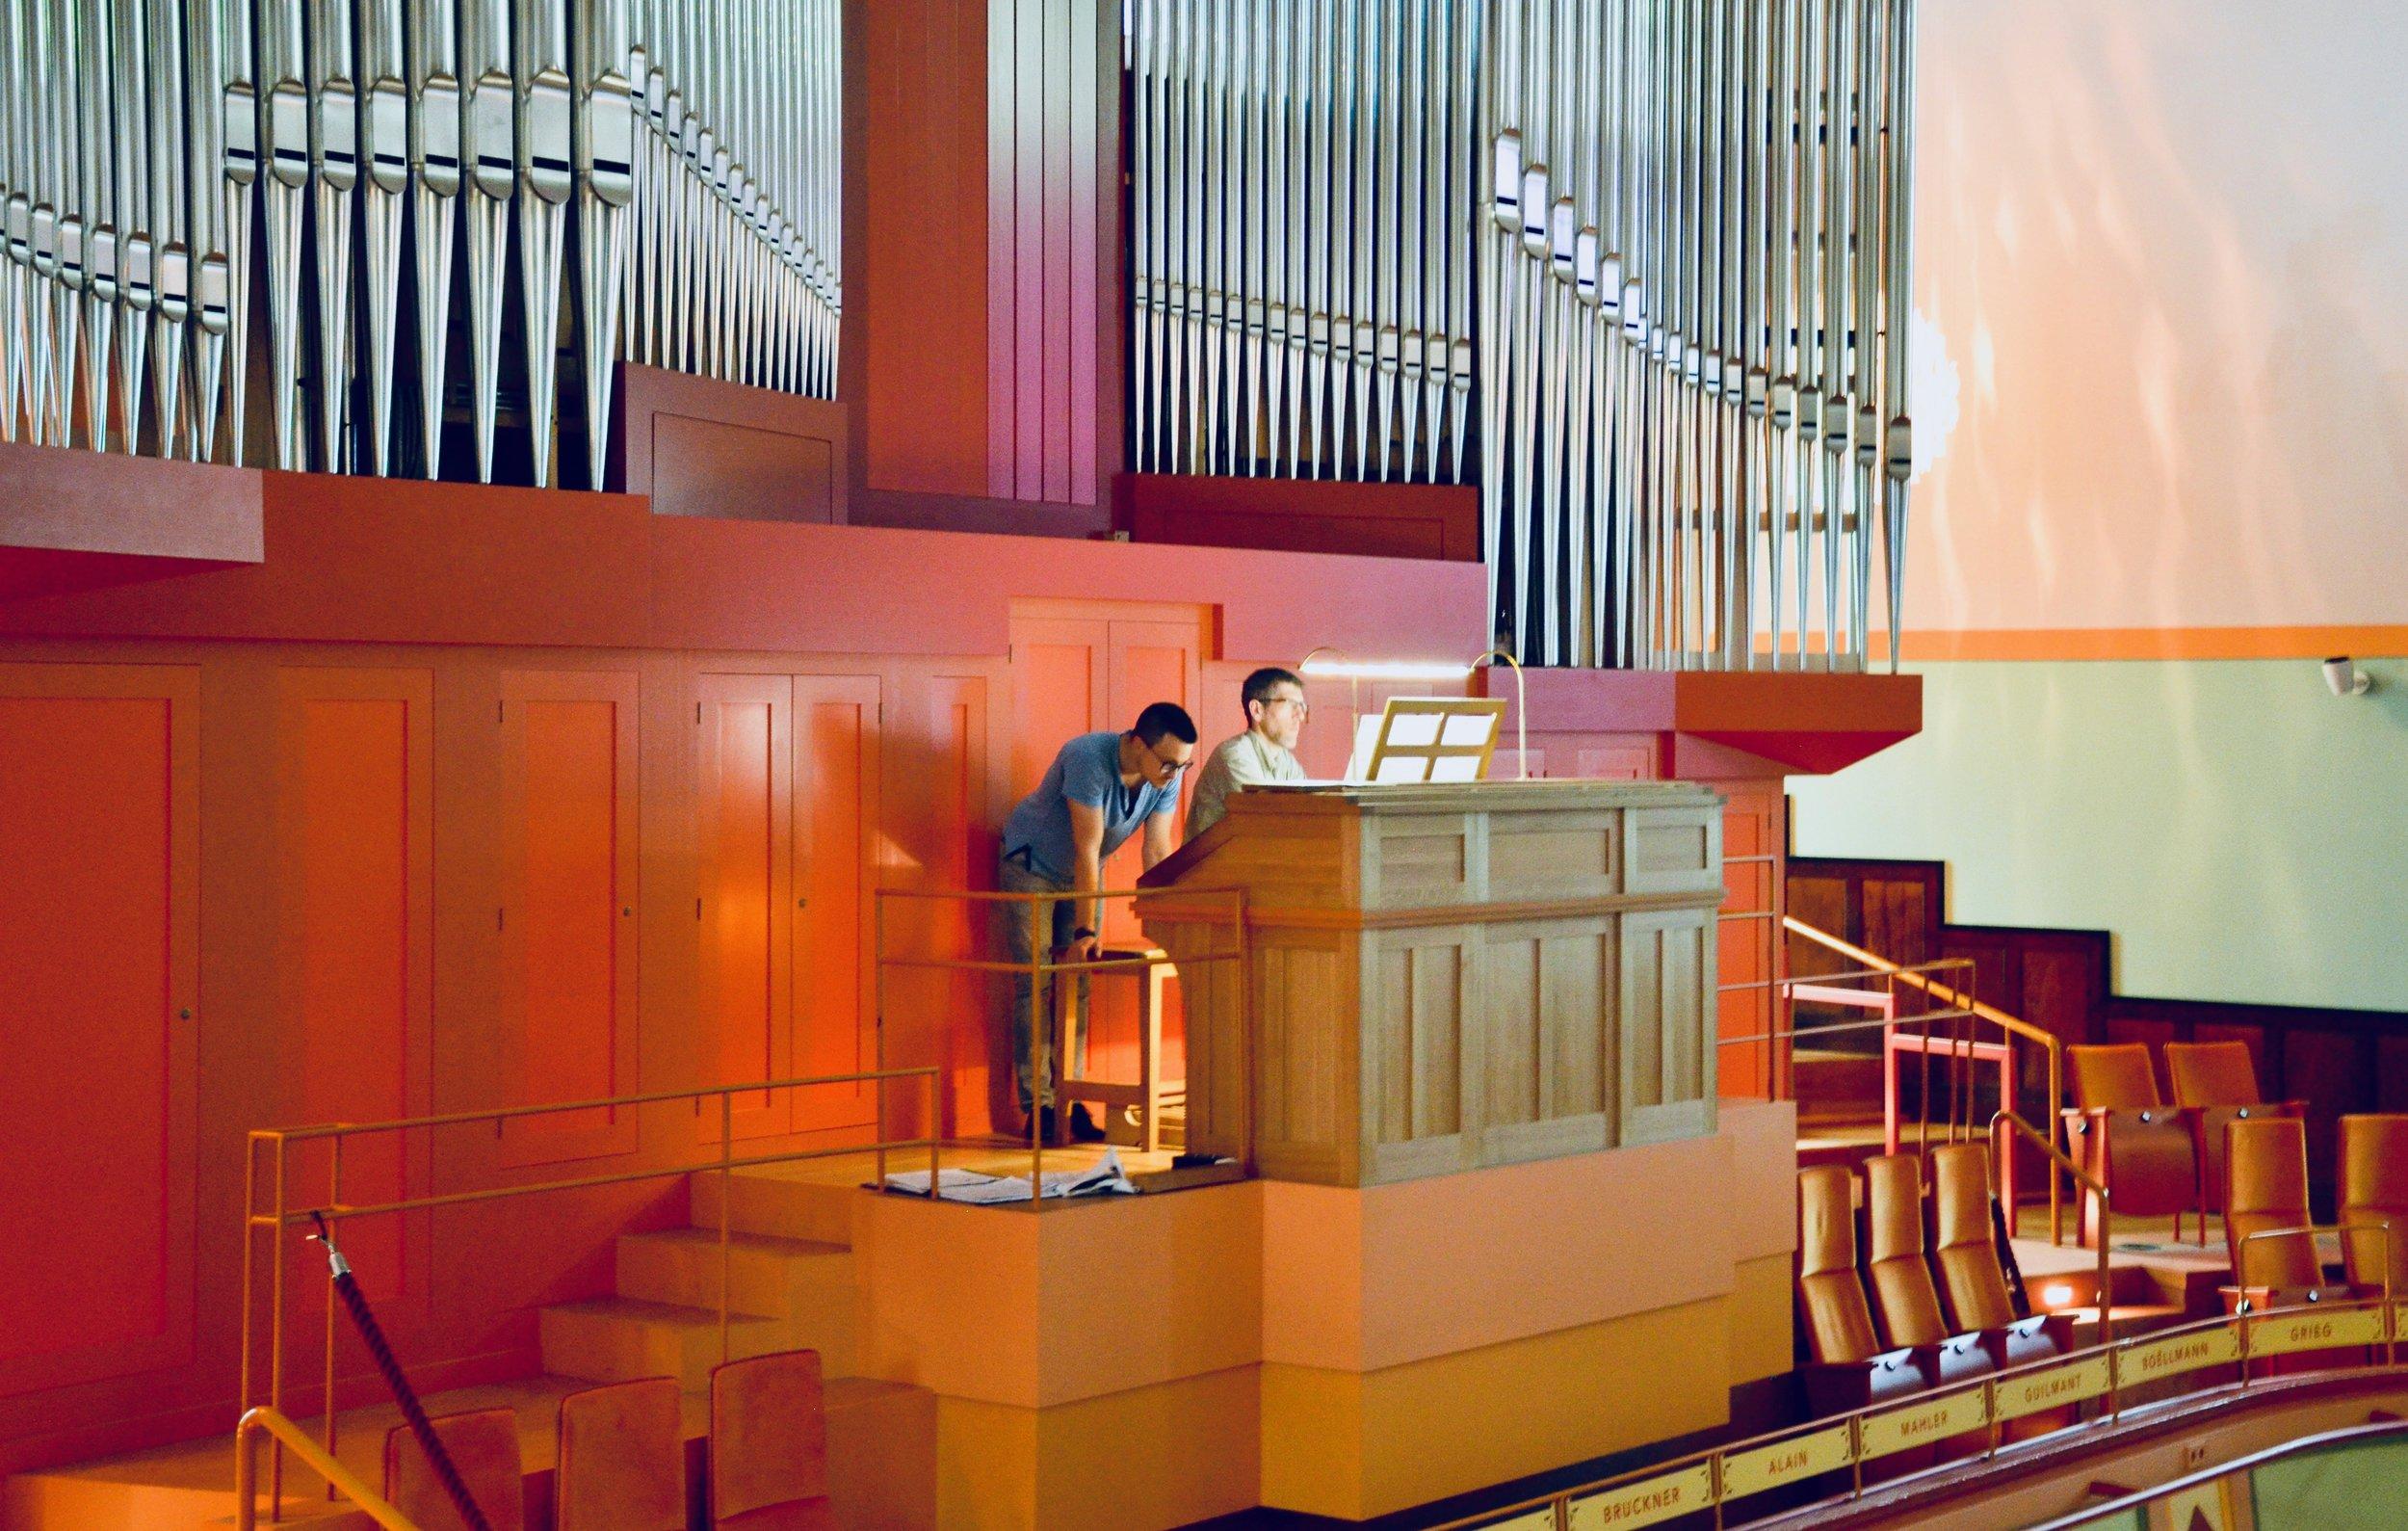 Chris Porter plays Franck on the French romantic organ of Orgelpark, Amsterdam.